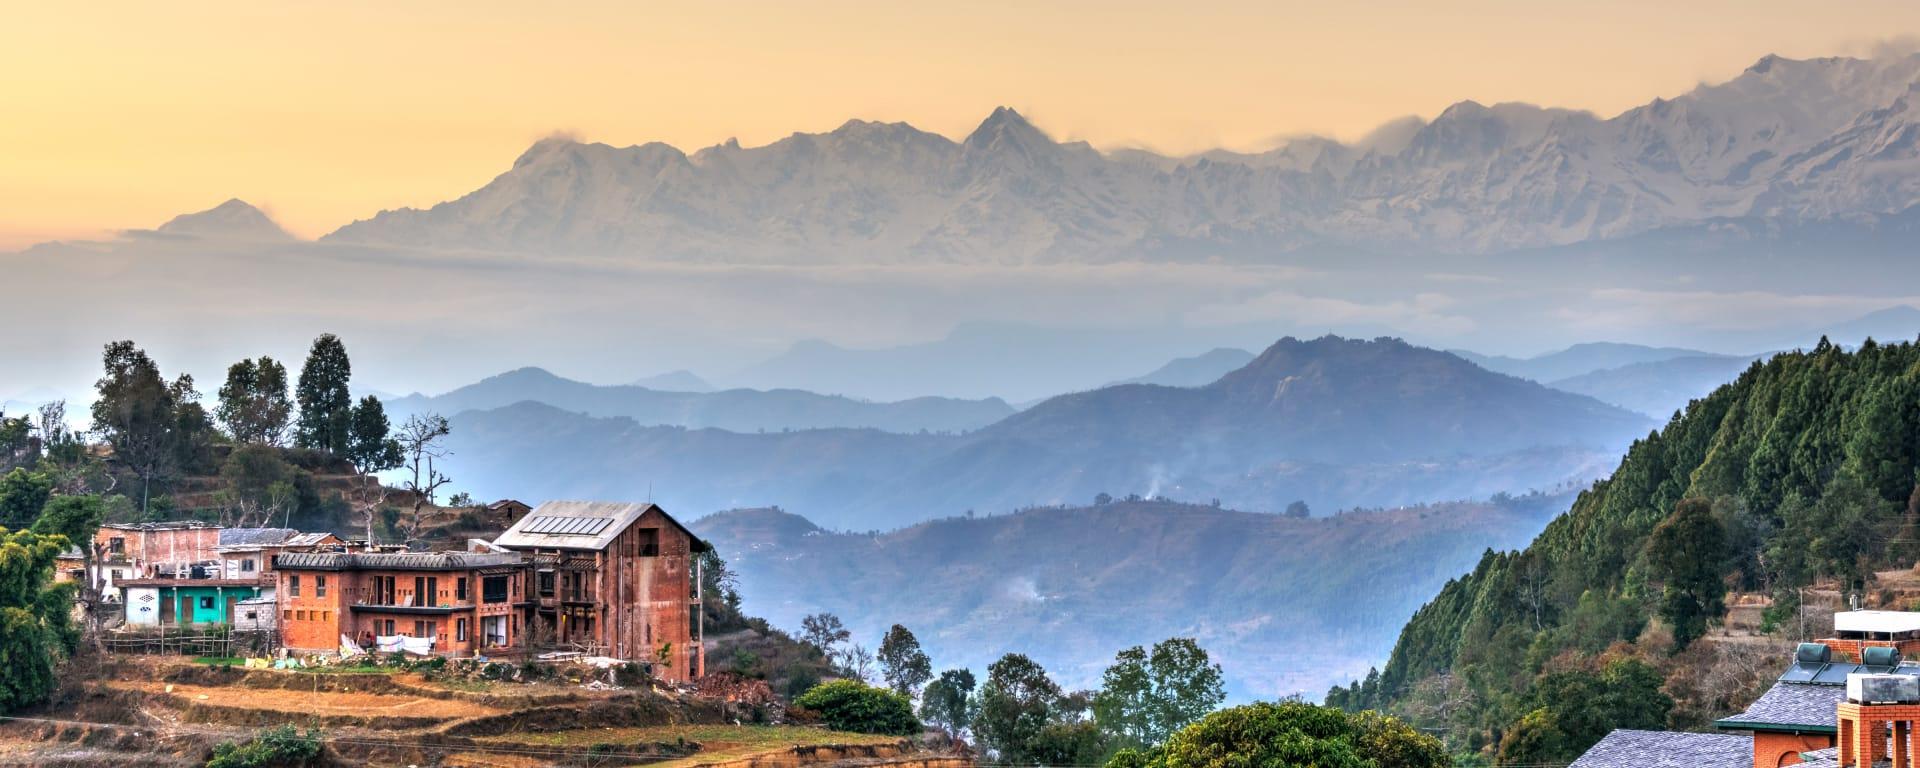 Nepal entdecken mit Tischler Reisen: Nepal Bandipur Panorama